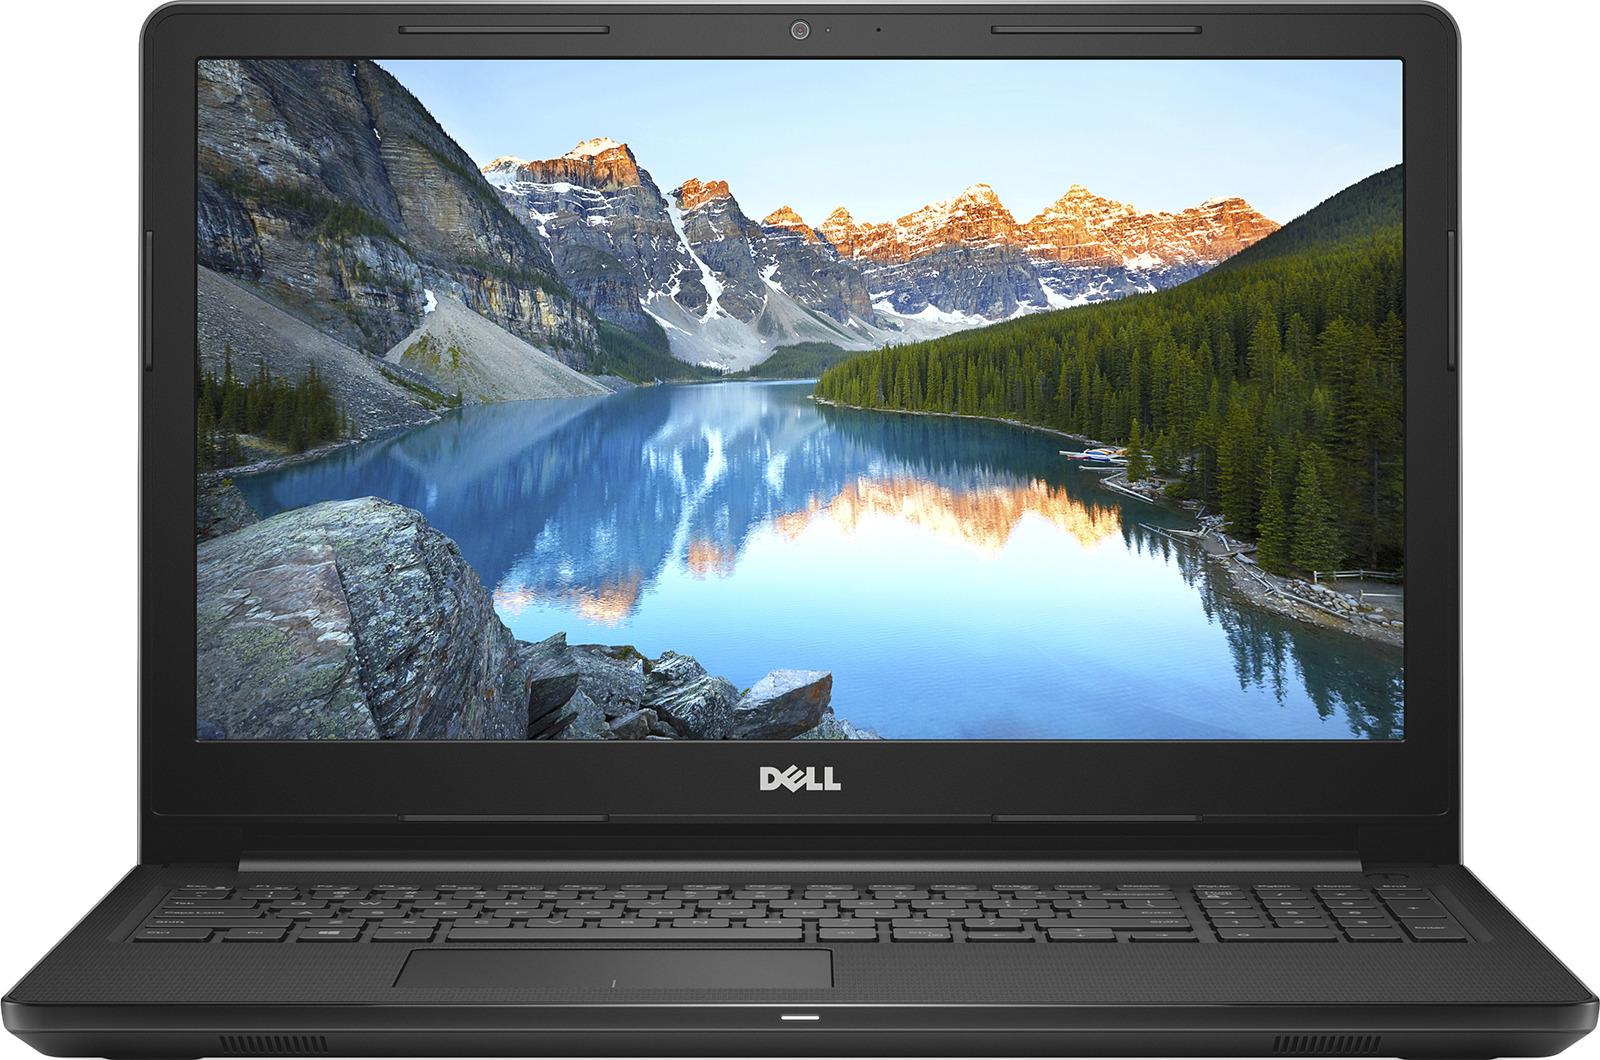 15.6 Ноутбук Dell Inspiron 3573 3573-6007, серый ноутбук dell inspiron 3573 3573 6038 red 15 6 hd cel n4000 4gb 500gb dvdrw w10